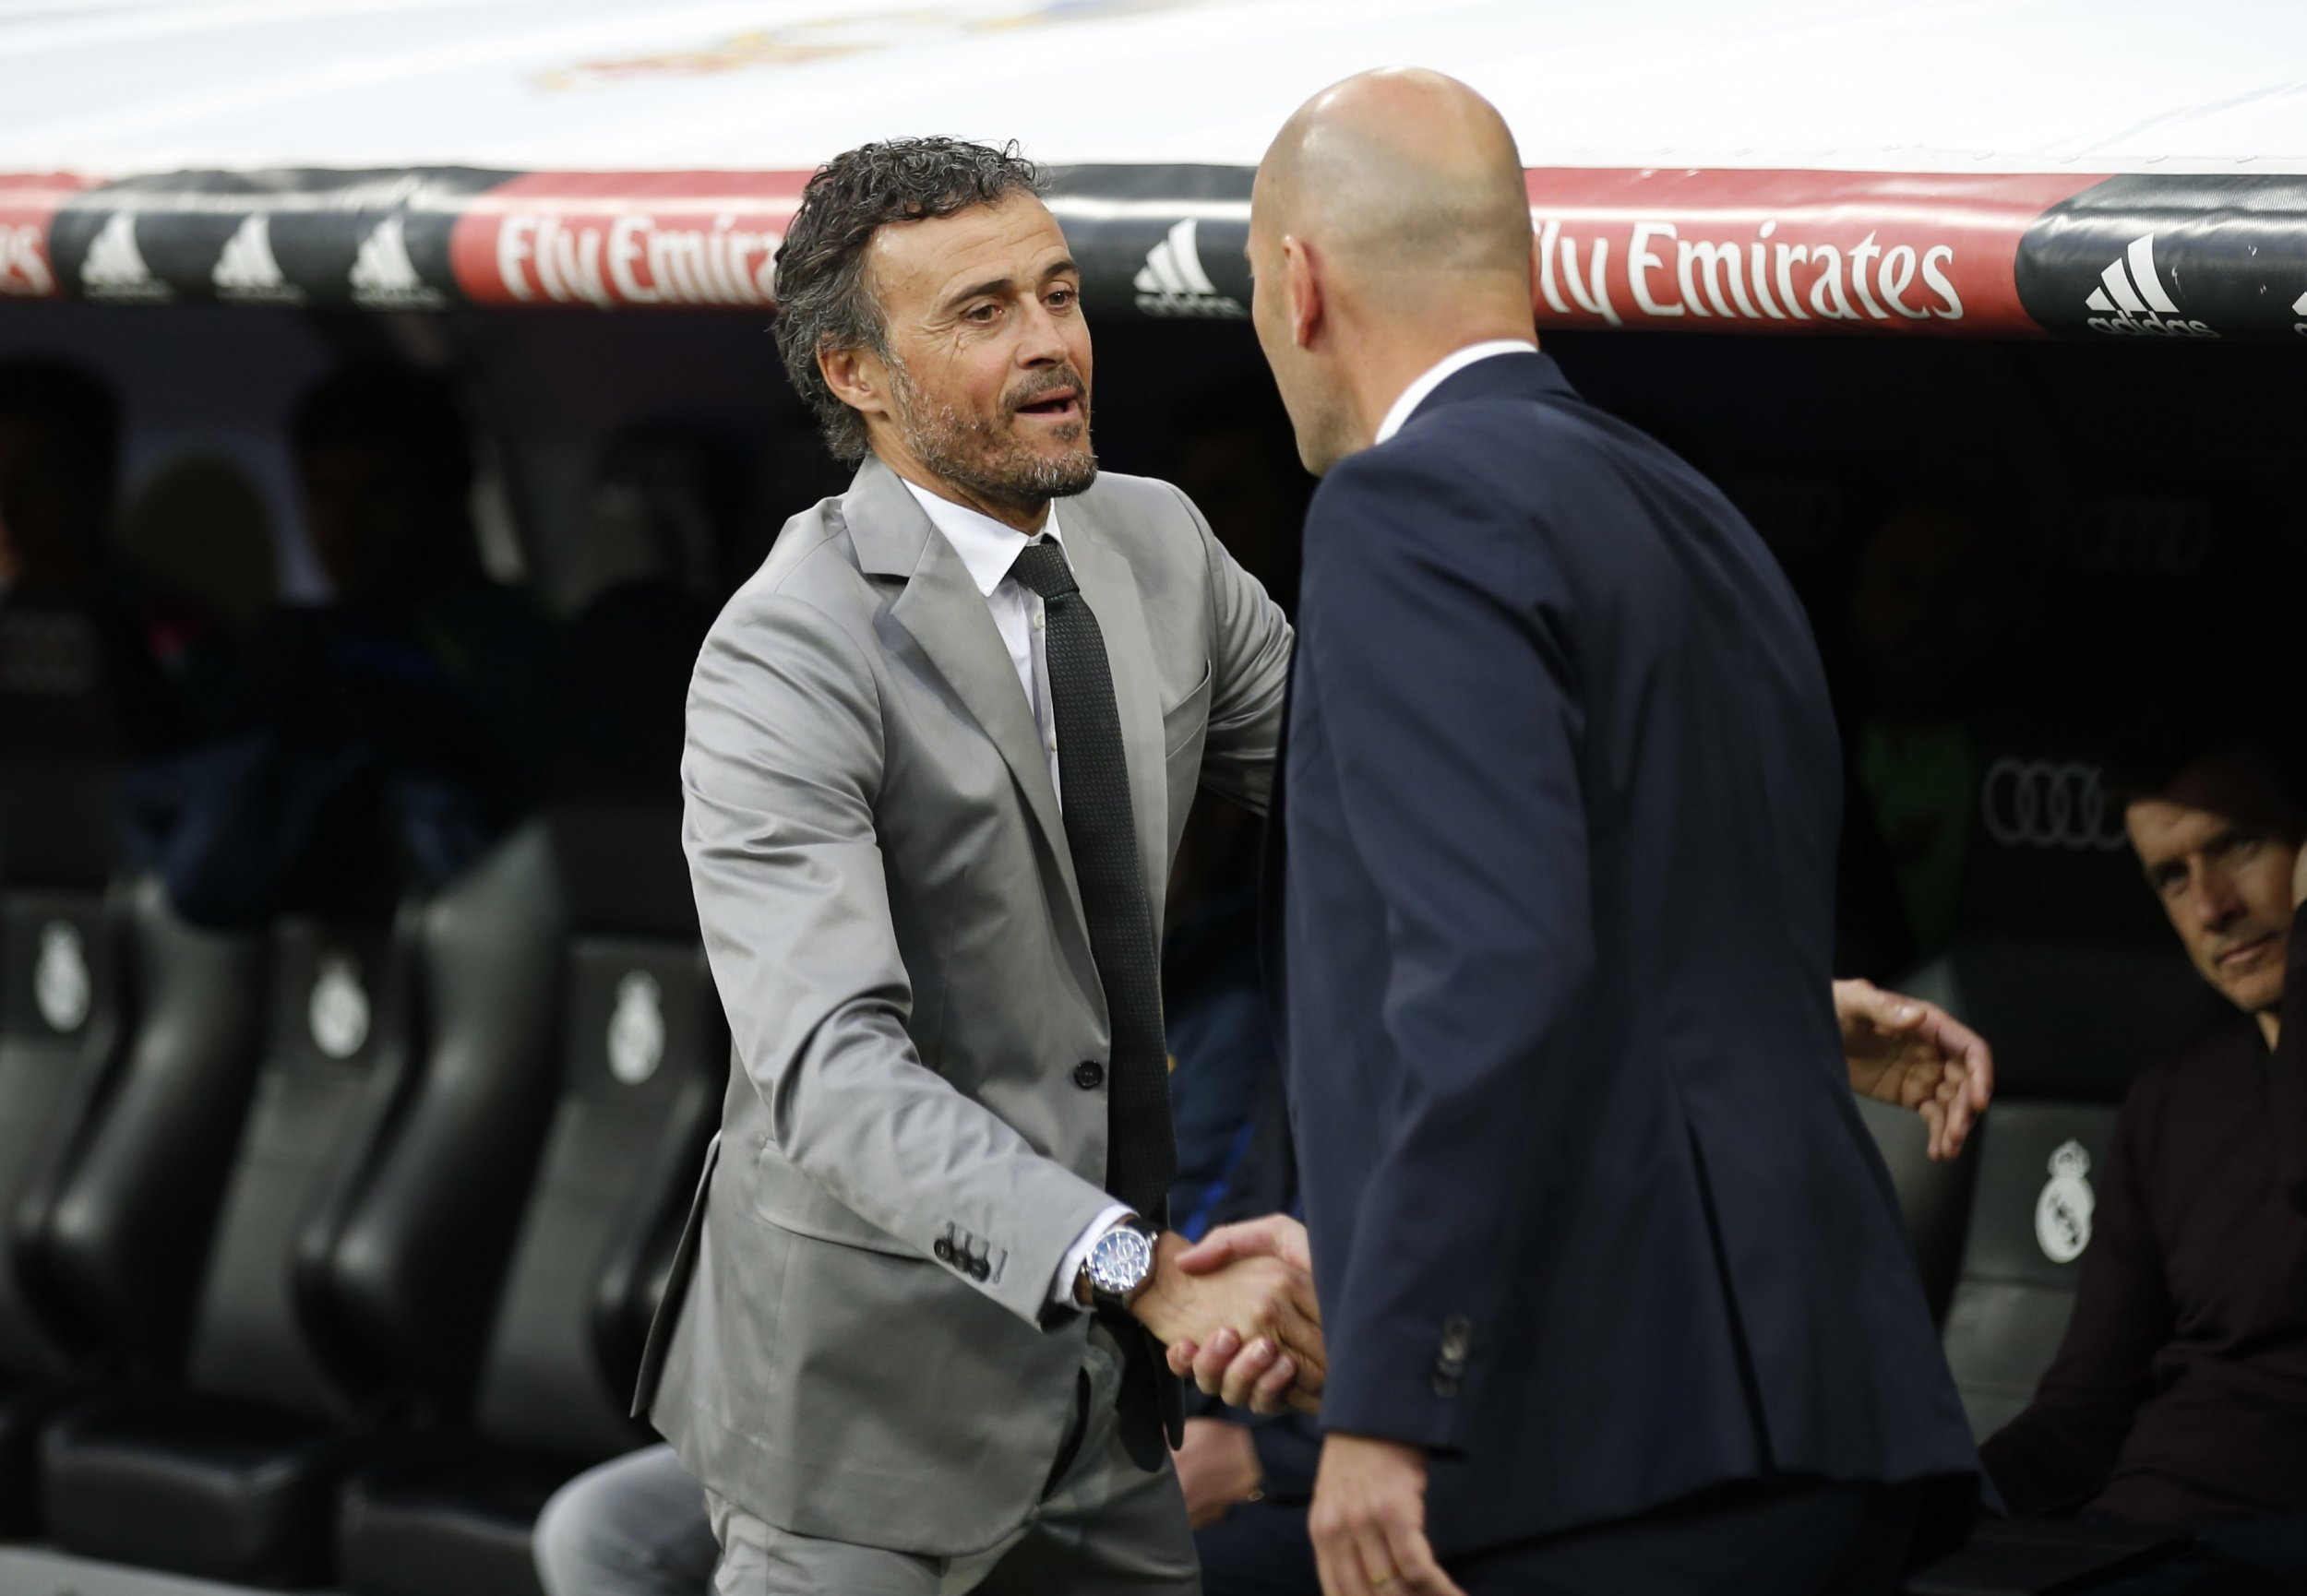 Enrique and Zidane